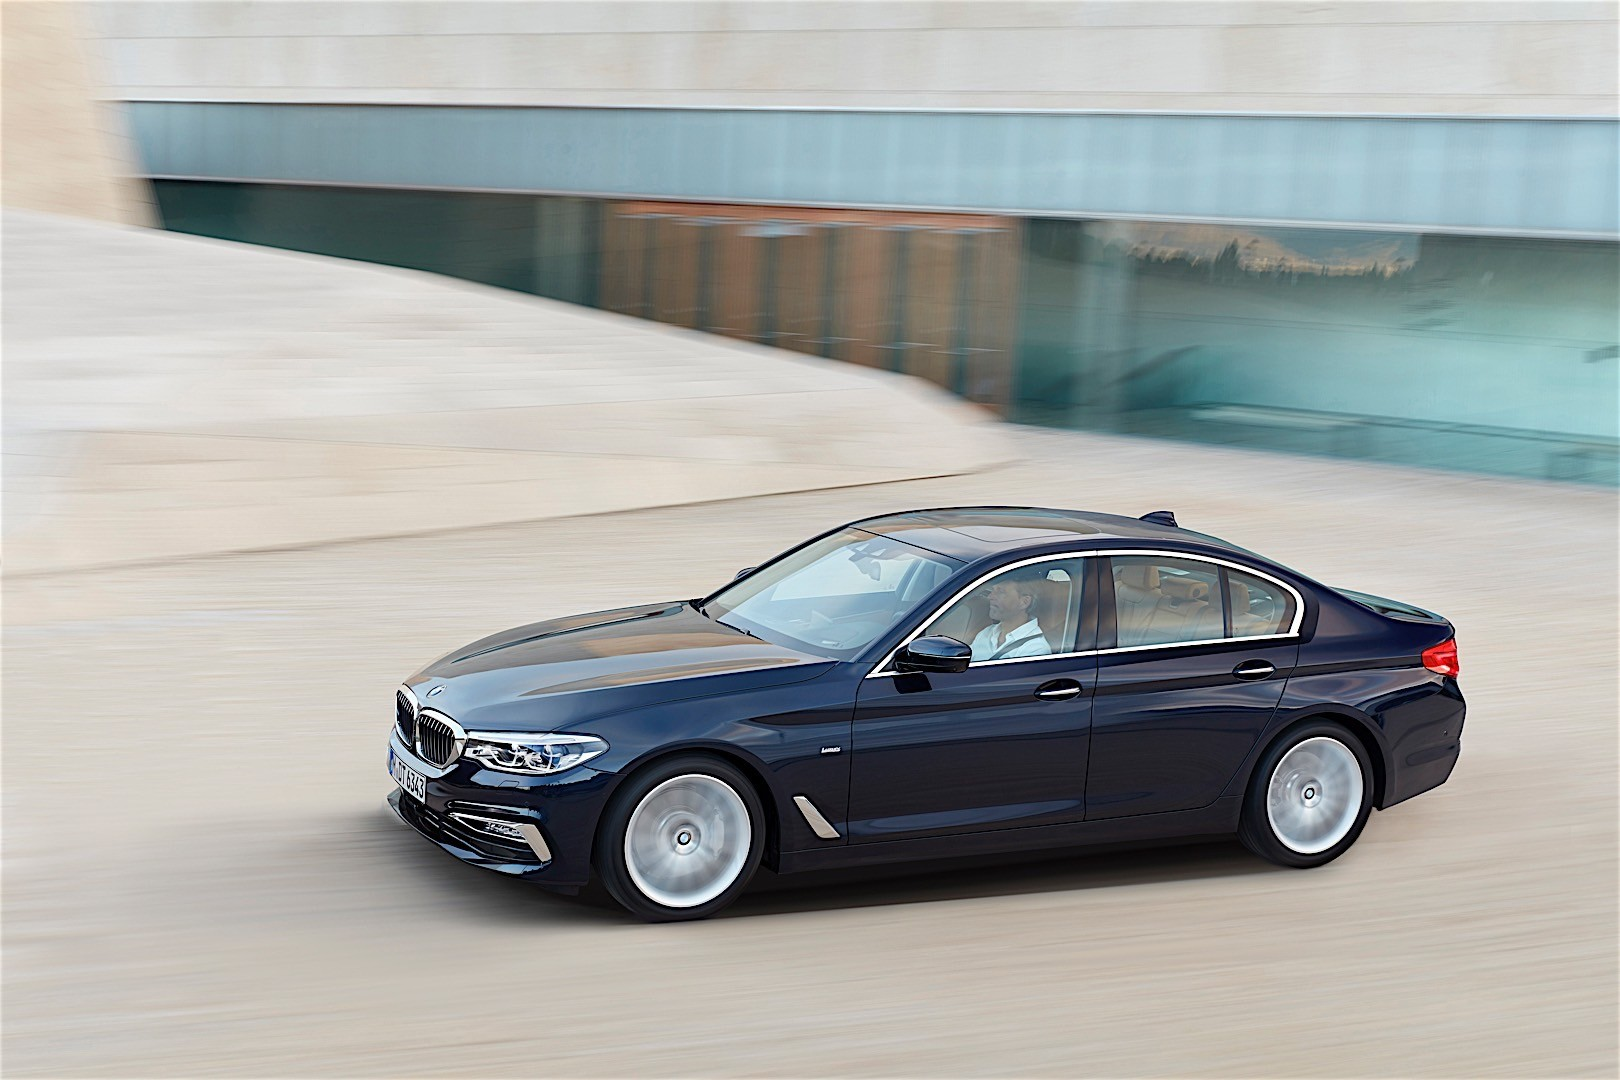 BMW 5 Series G30 5803 38